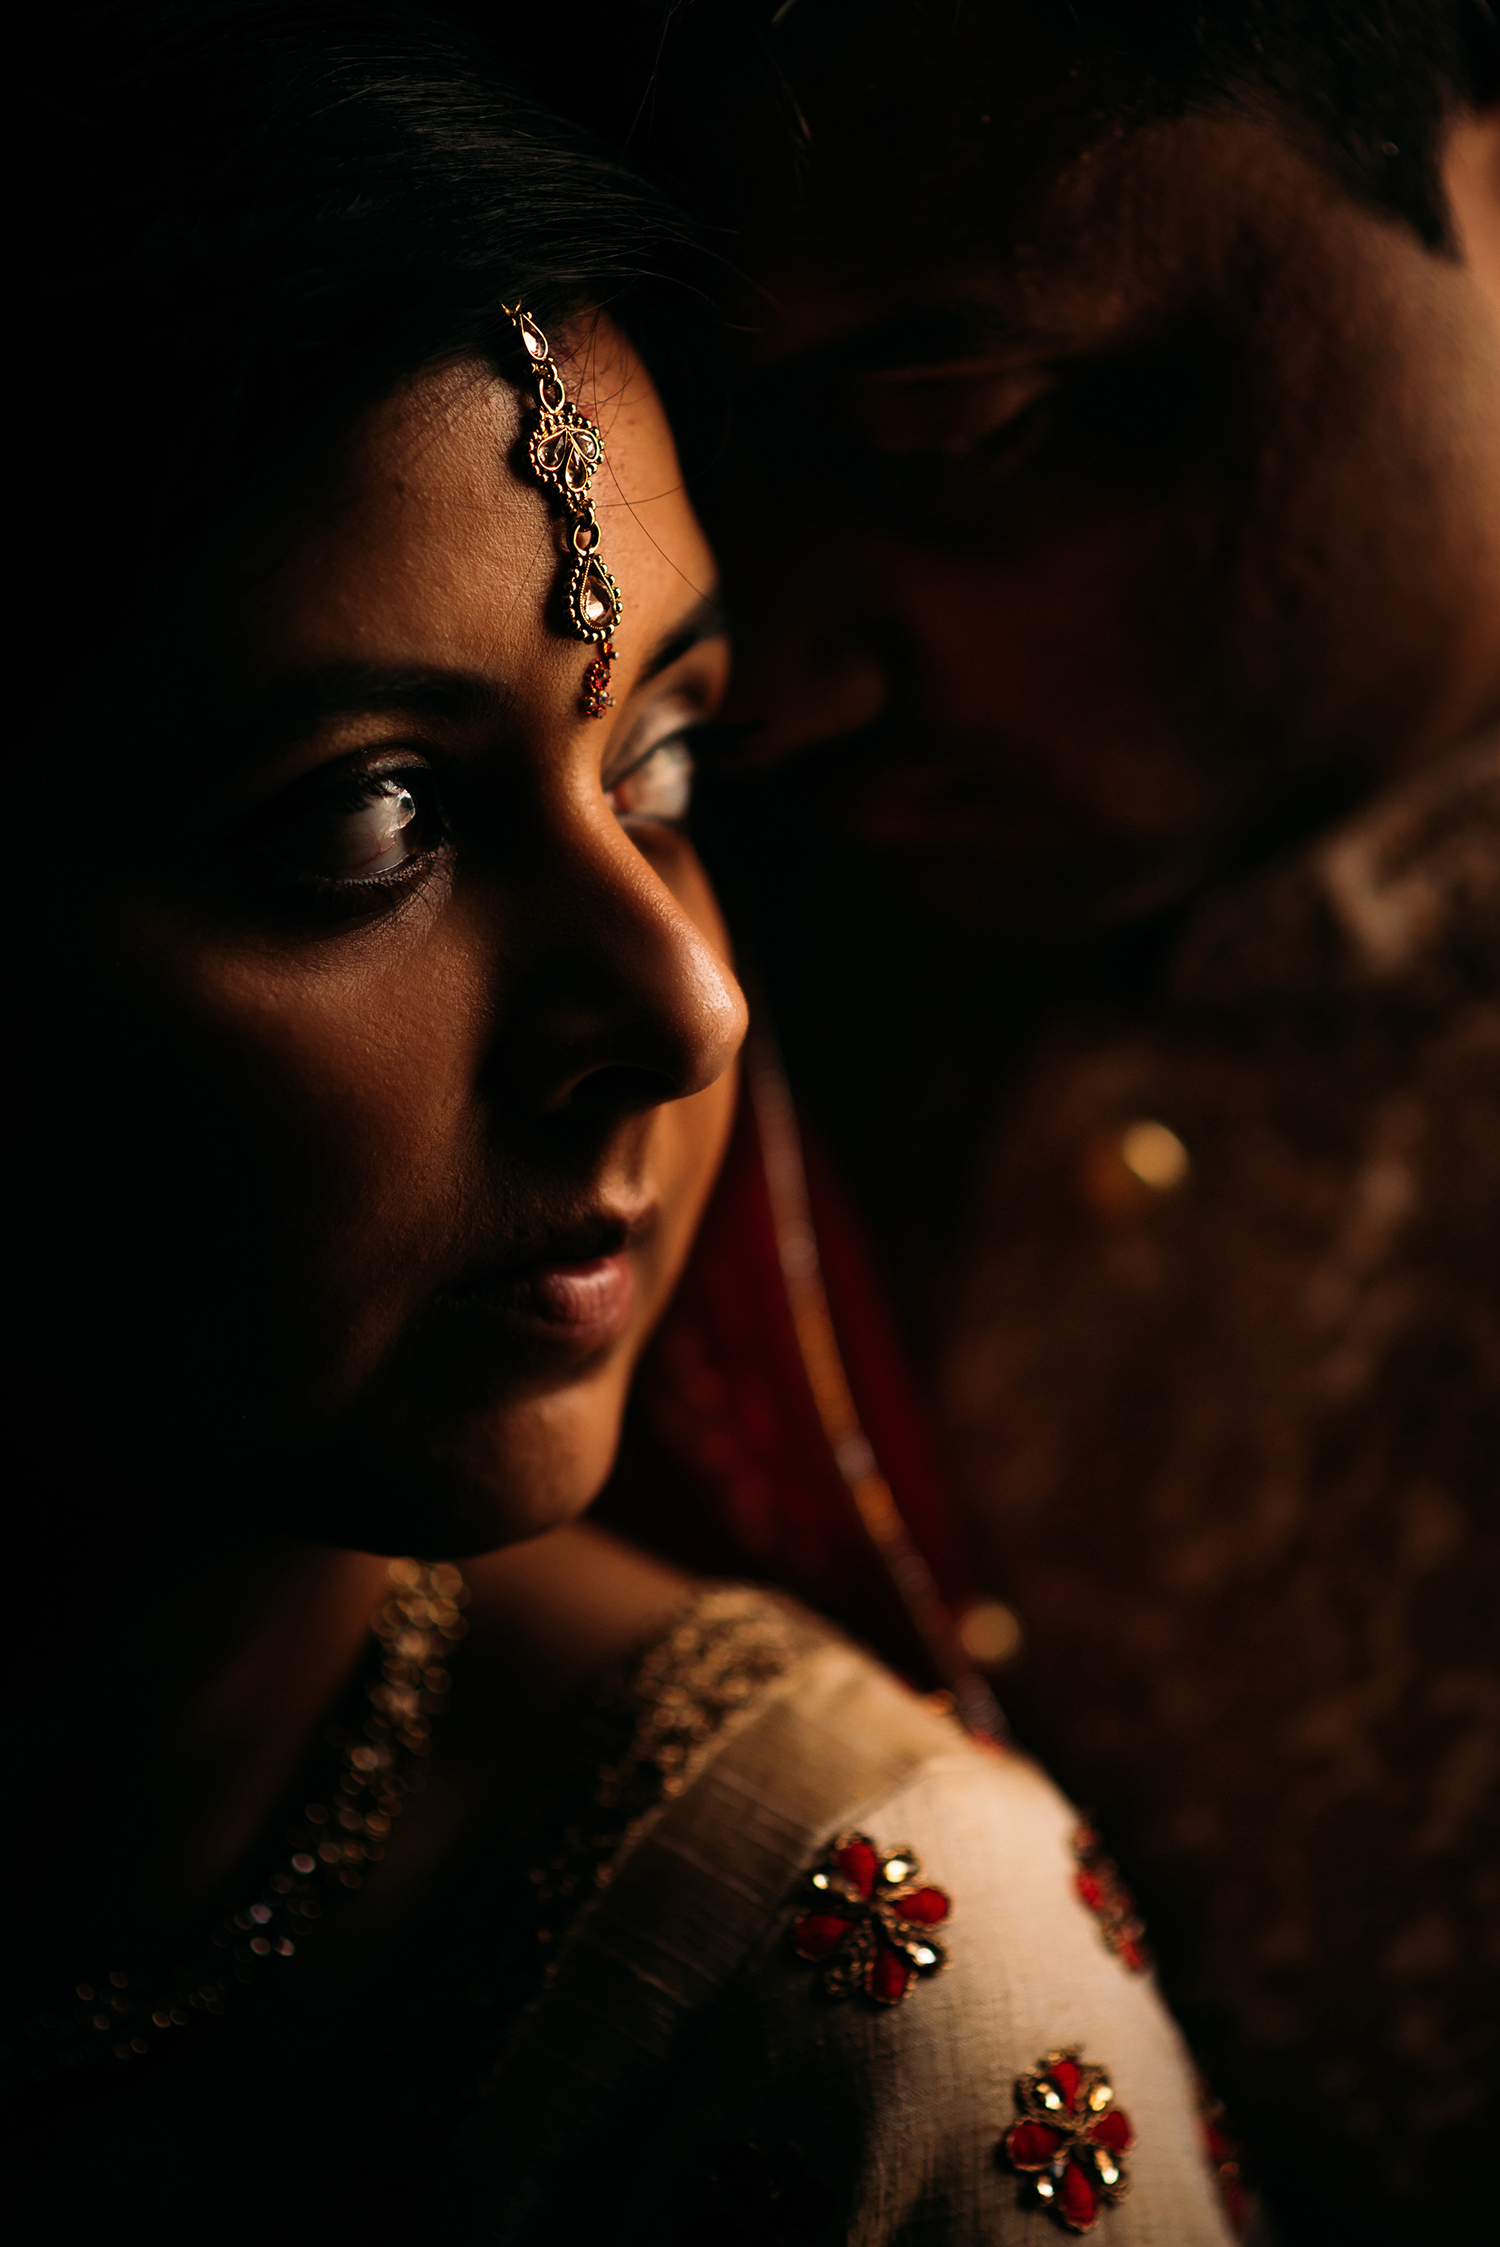 dark photo of bride and groom by brilliant window light